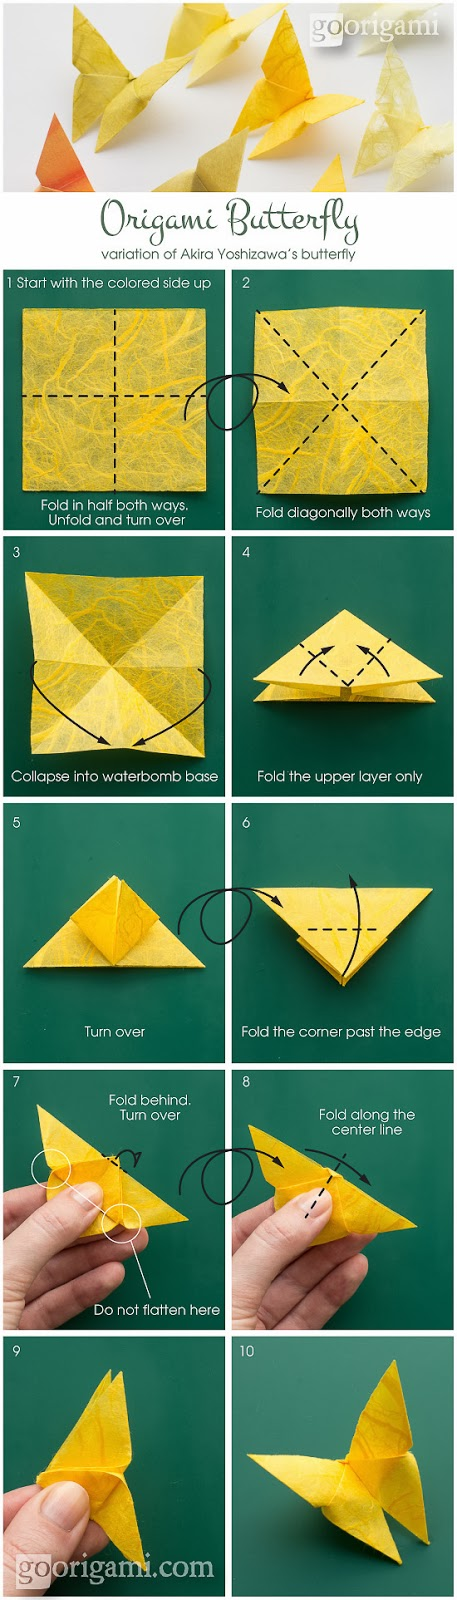 cara membuat origami kupukupu dari kertas lipat